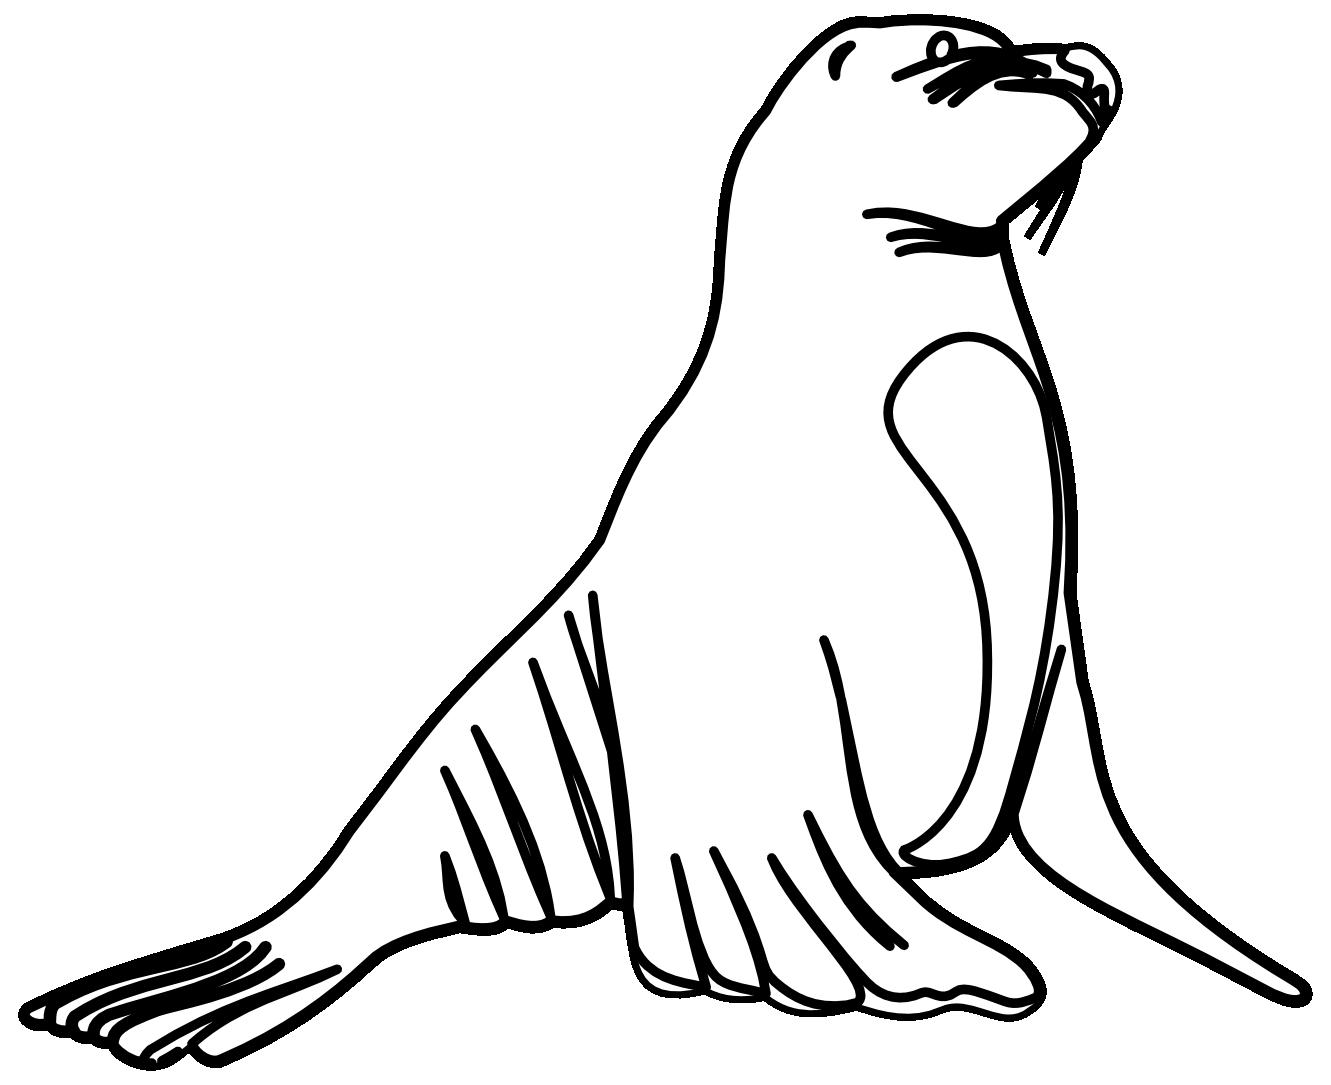 Sea lion clipart black and white